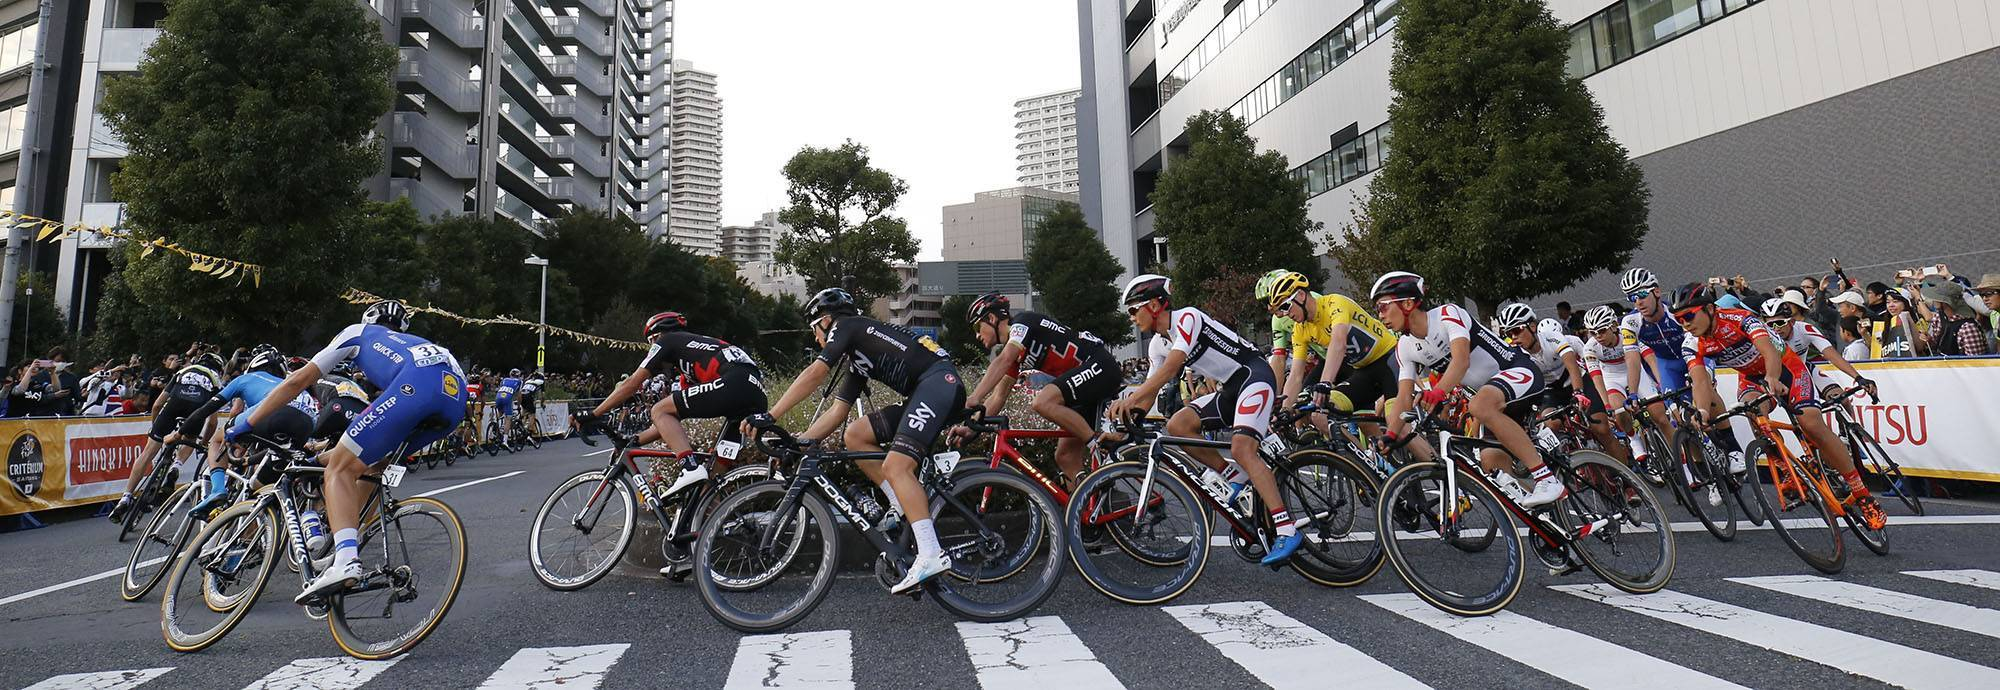 Header: L'histoire de Critérium de Saitama